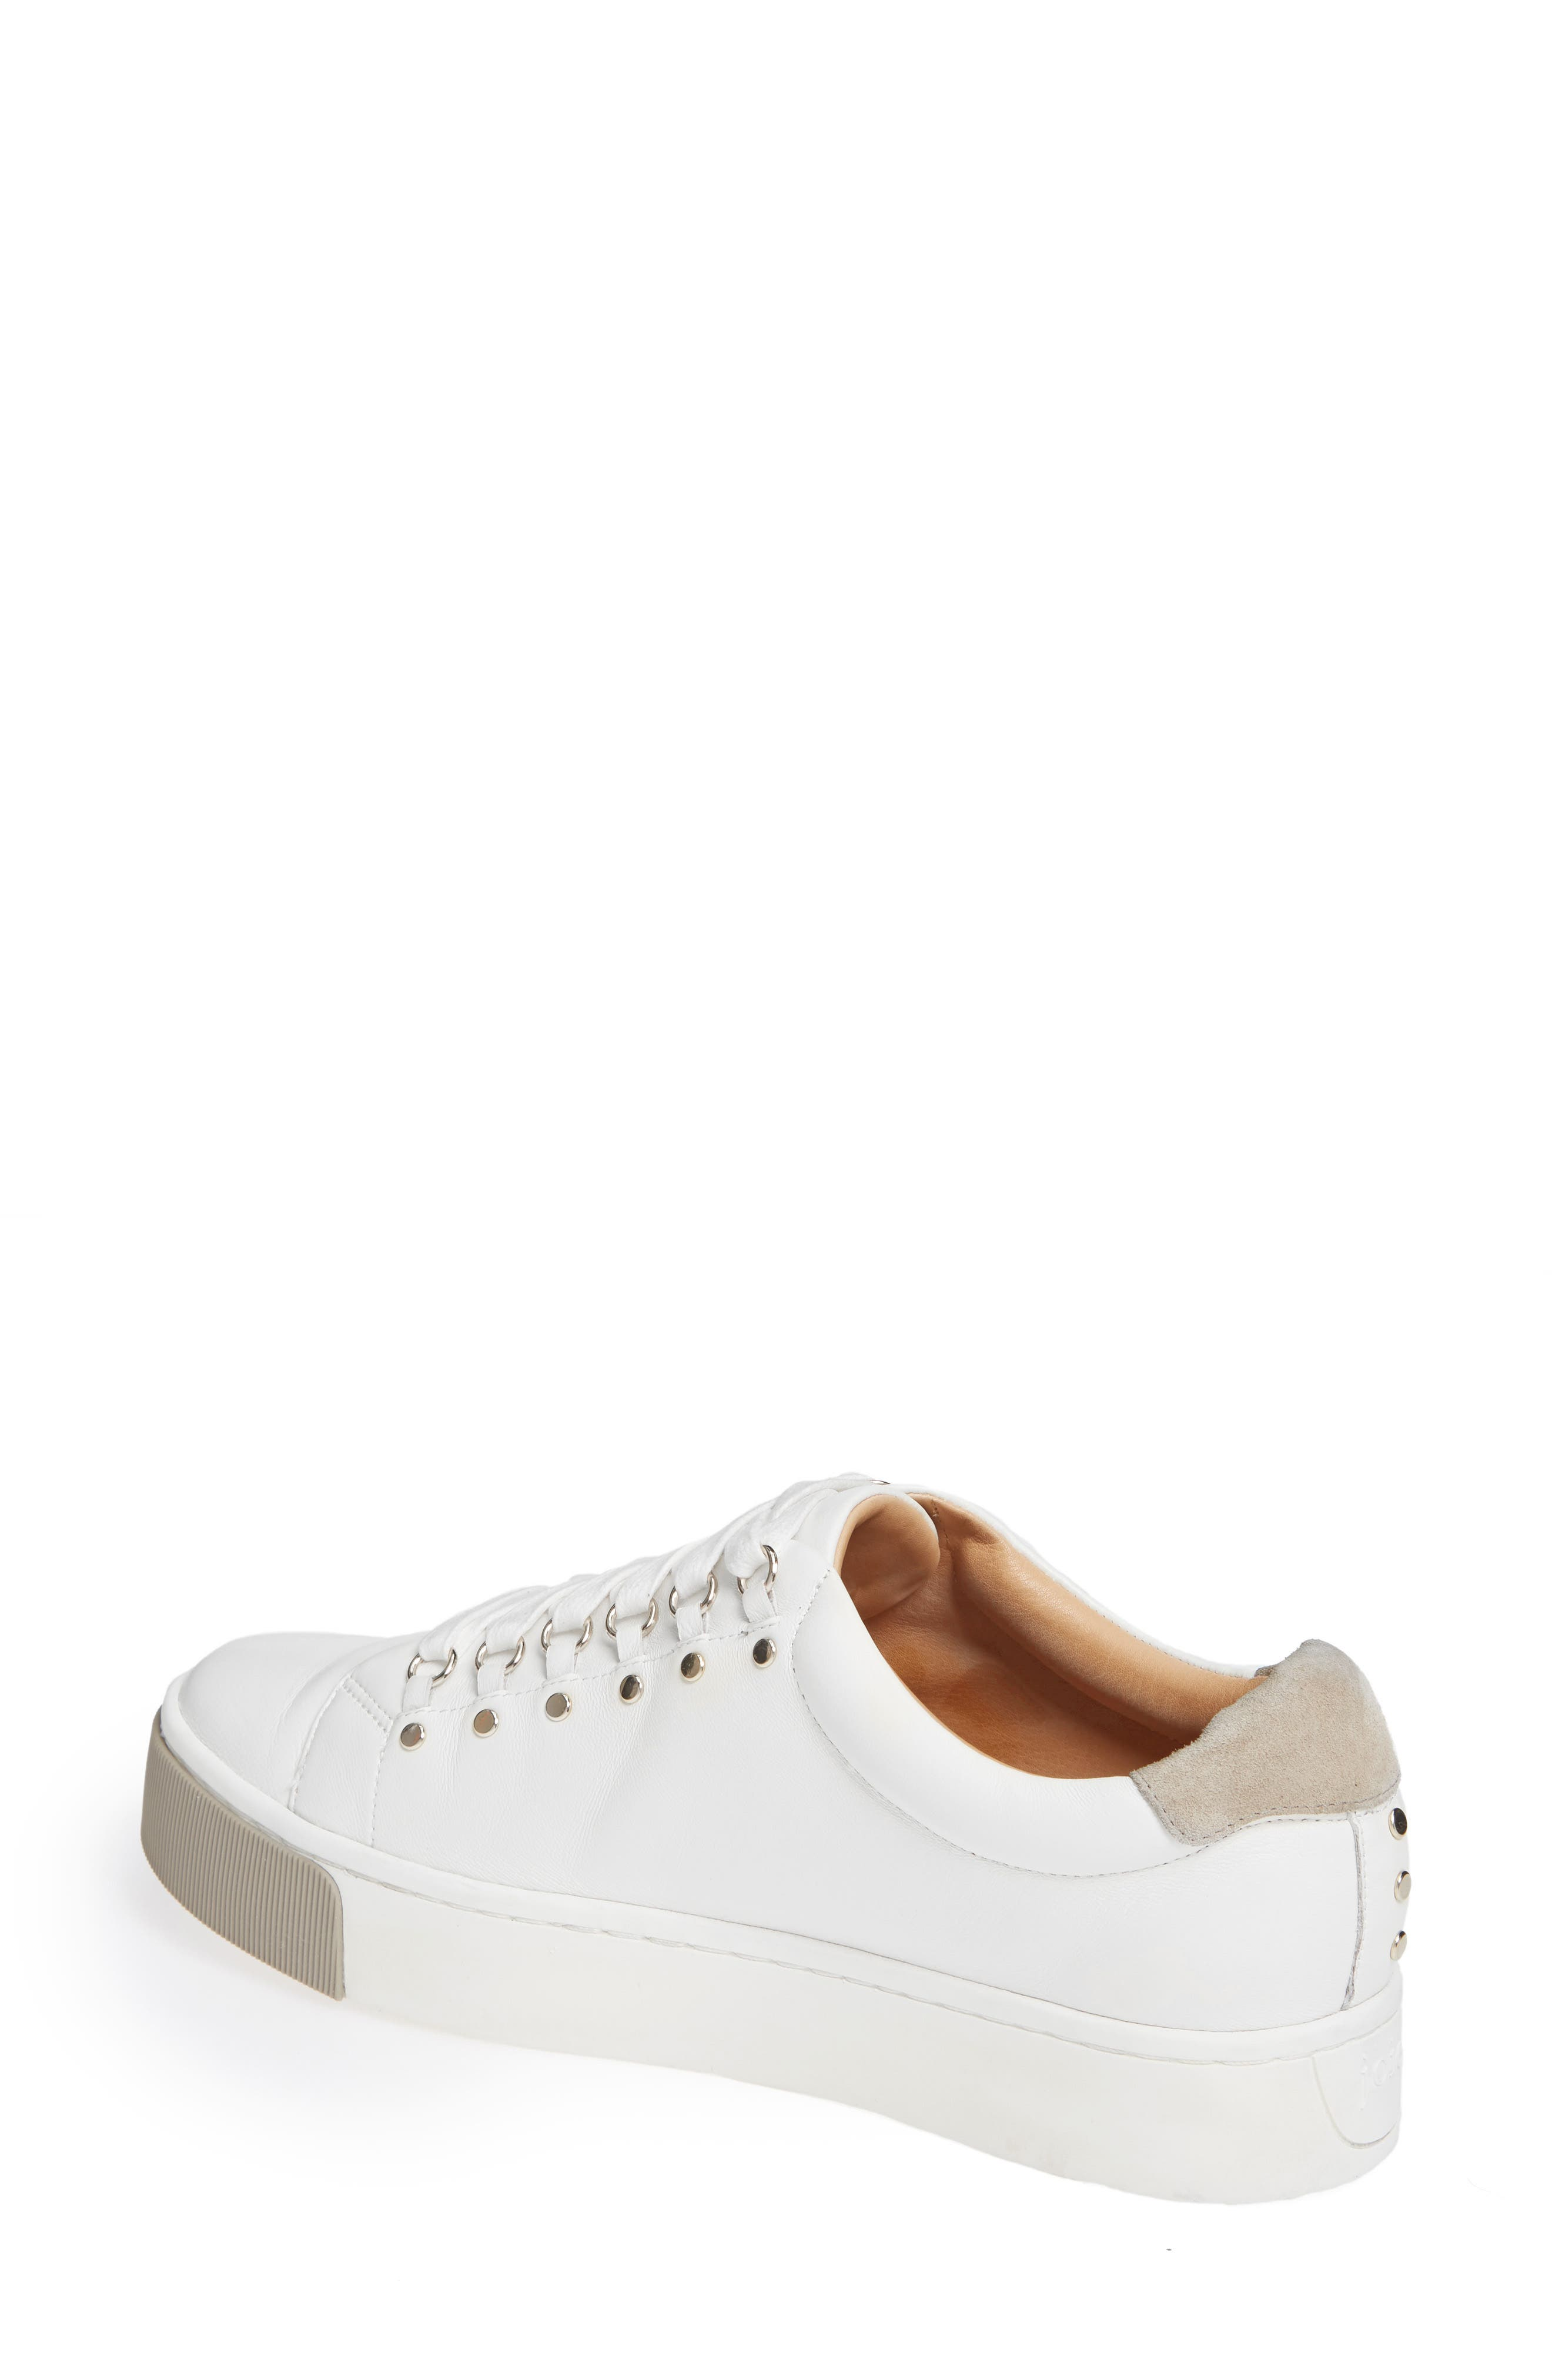 Handan Lace-Up Sneaker,                             Alternate thumbnail 2, color,                             WHITE